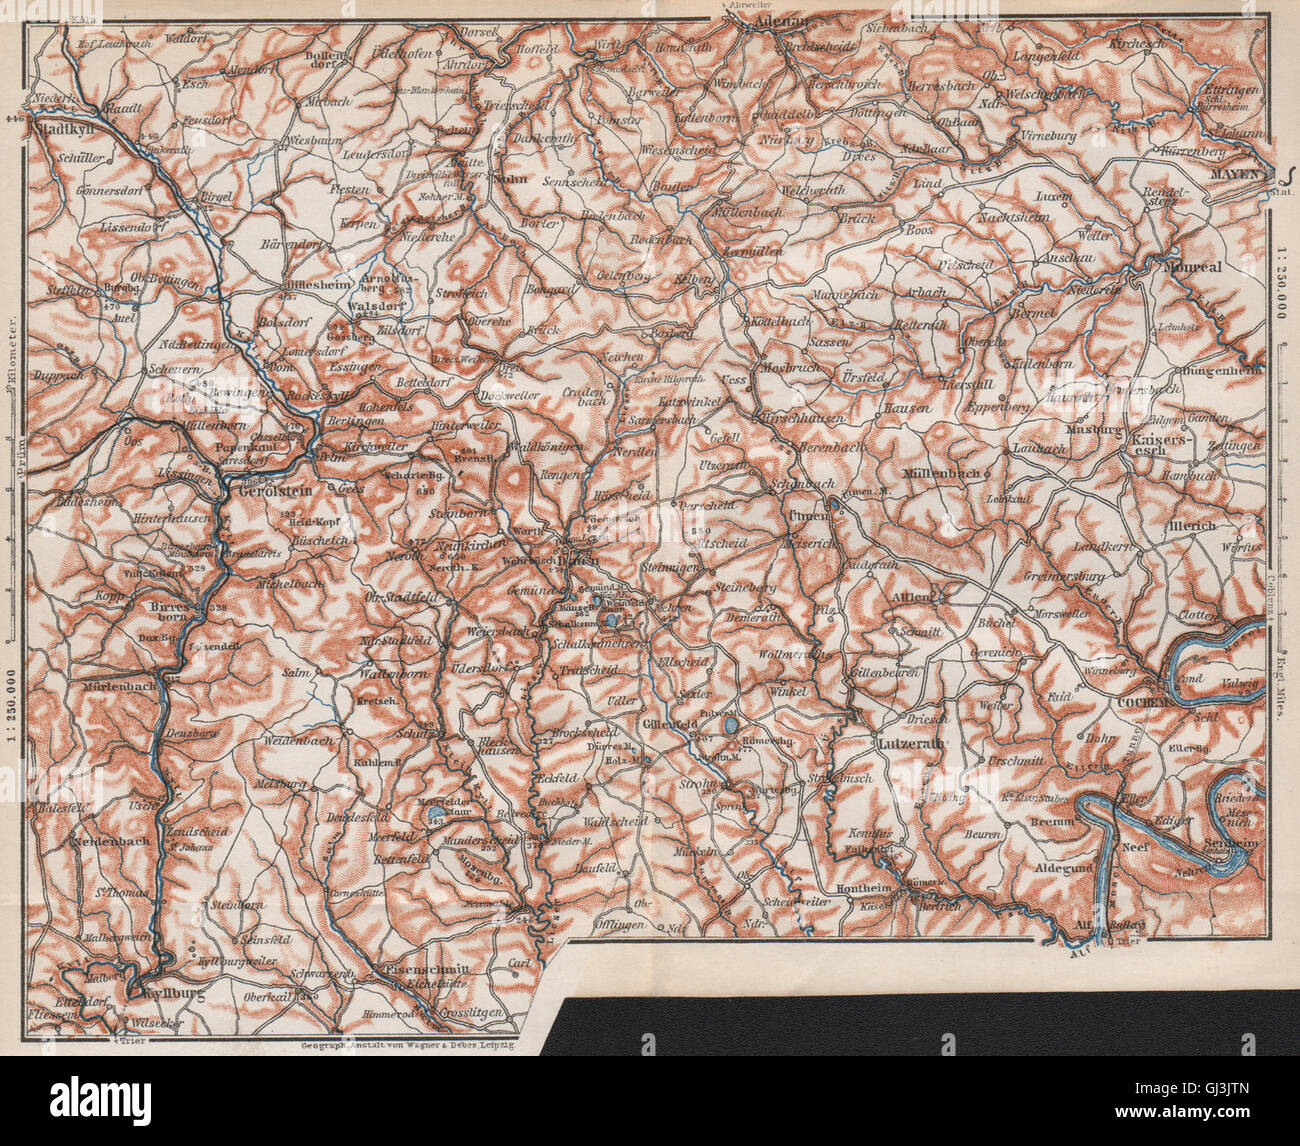 Karte Eifel.Vulkaneifel The Volcanic Eifel Topo Map Gerolstein Germany Karte